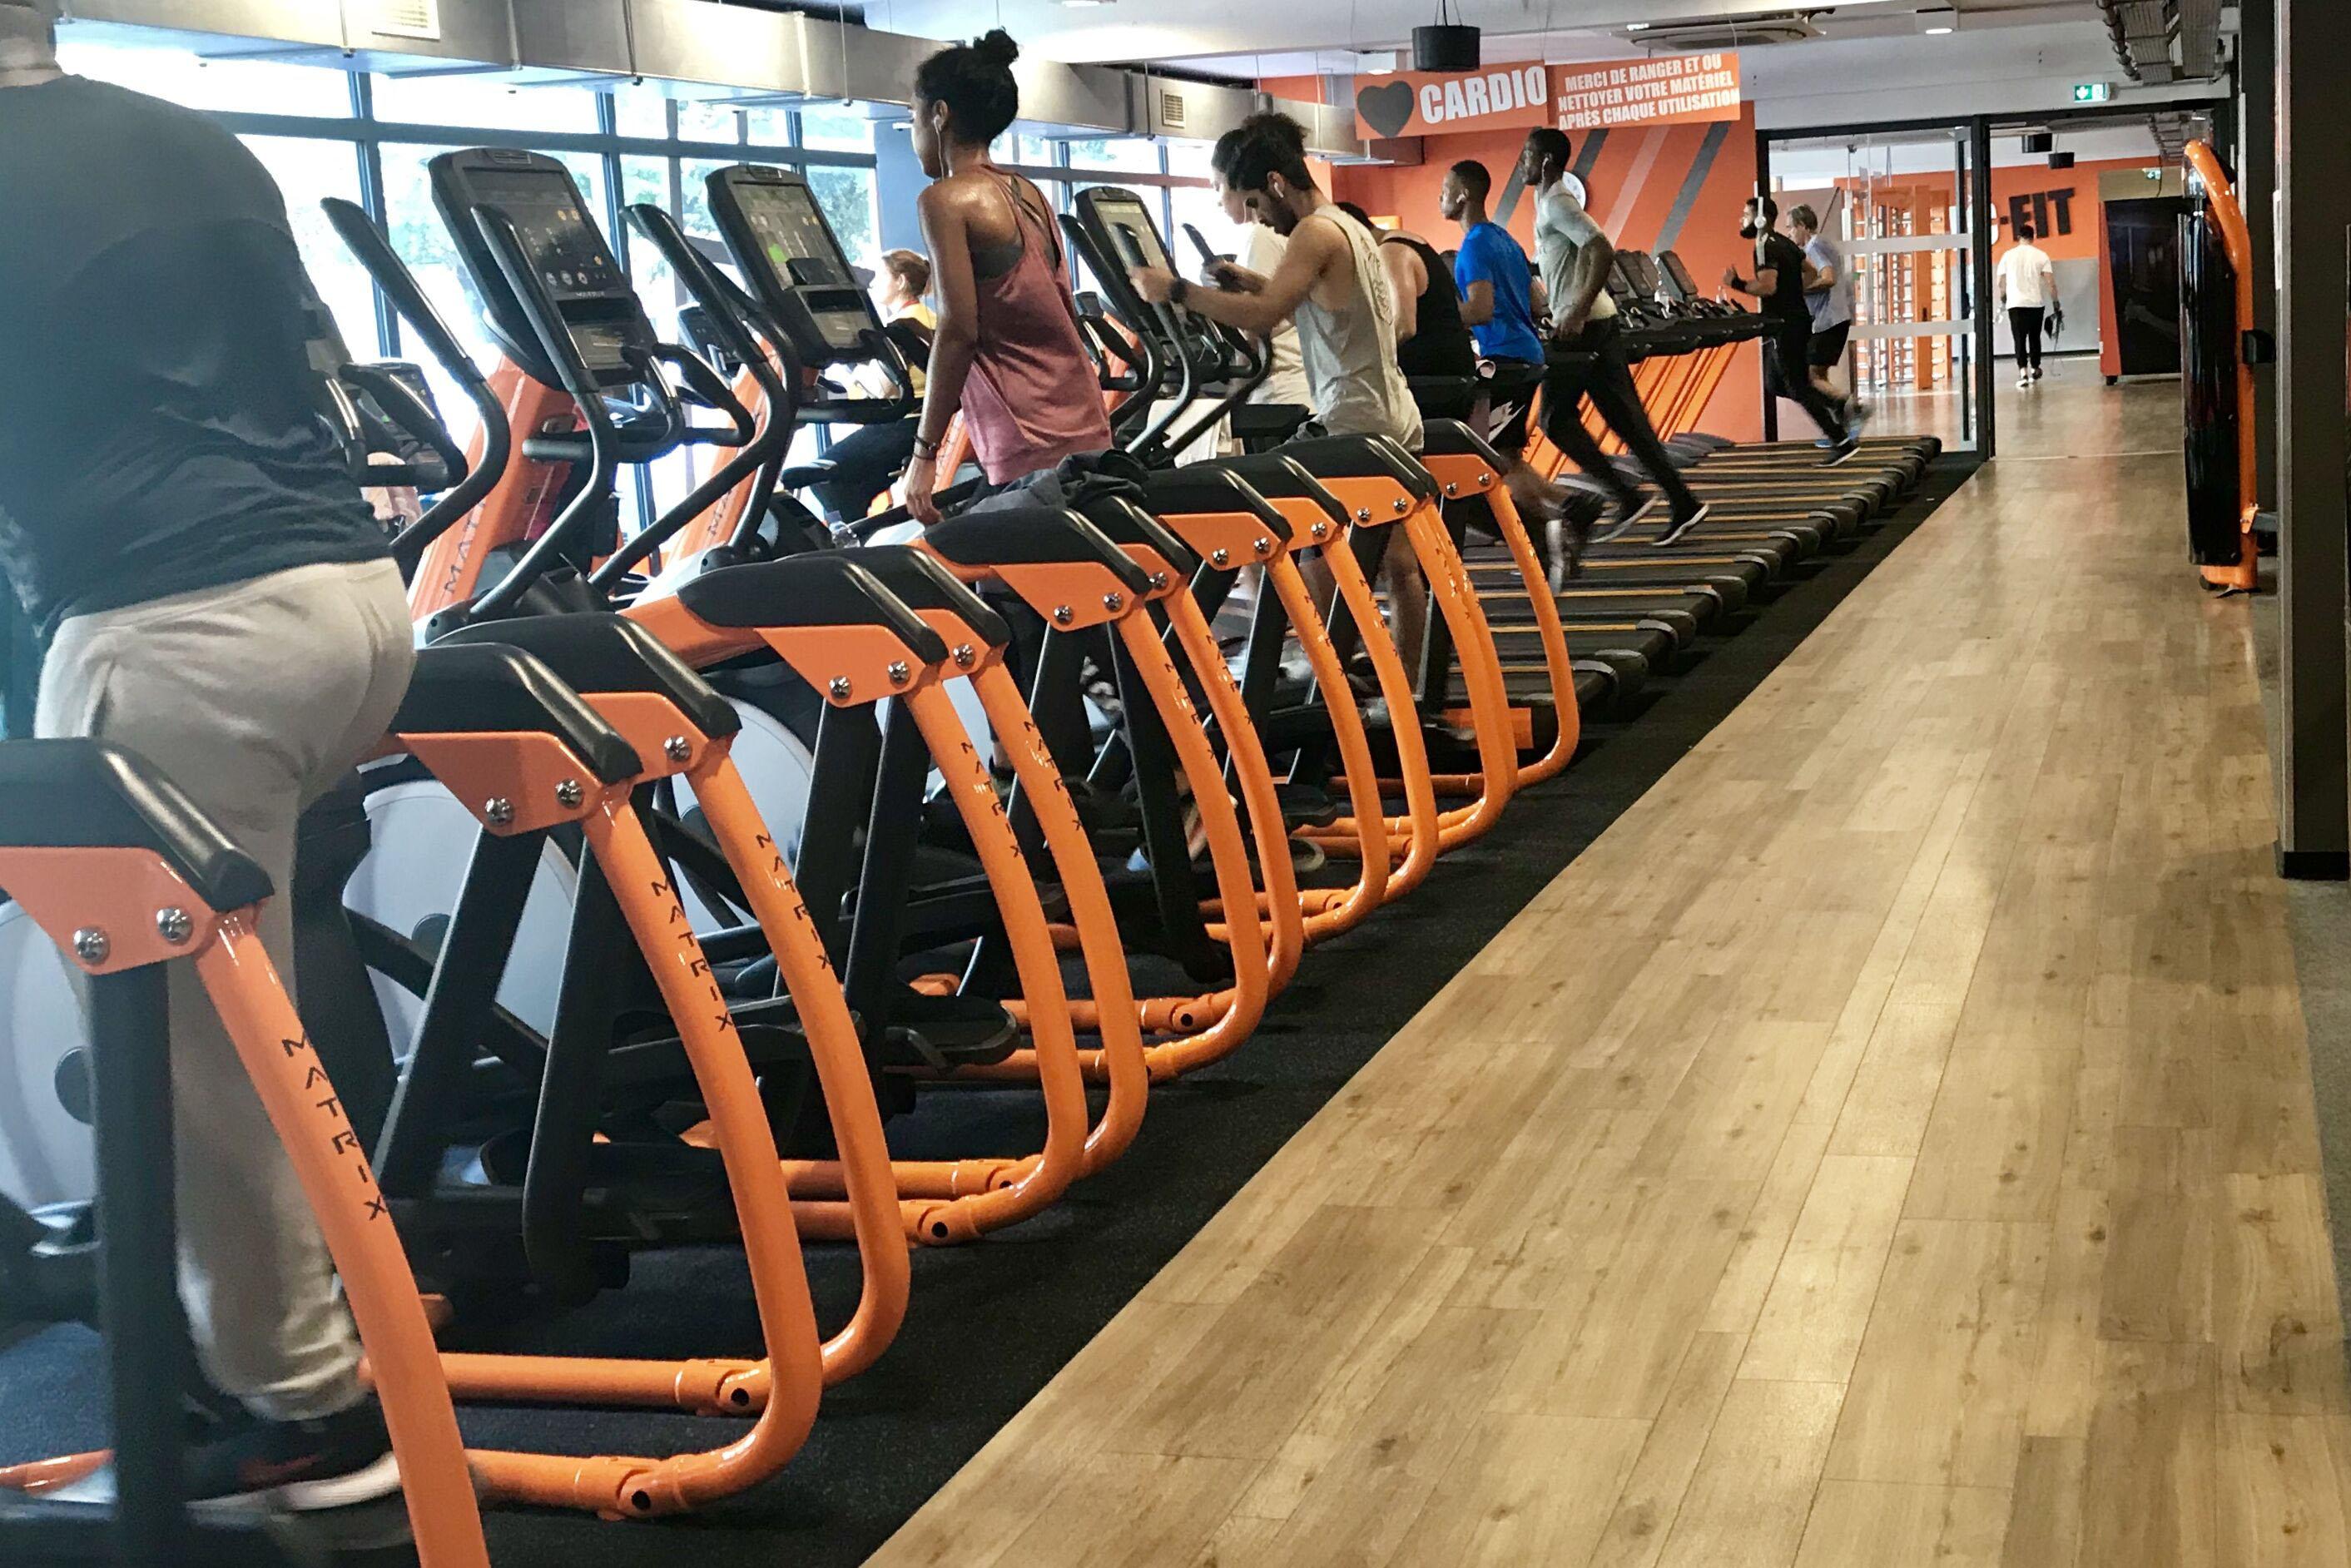 Basic Fit Gym Basic Fit Levallois Perret Avenue Jean Jaures